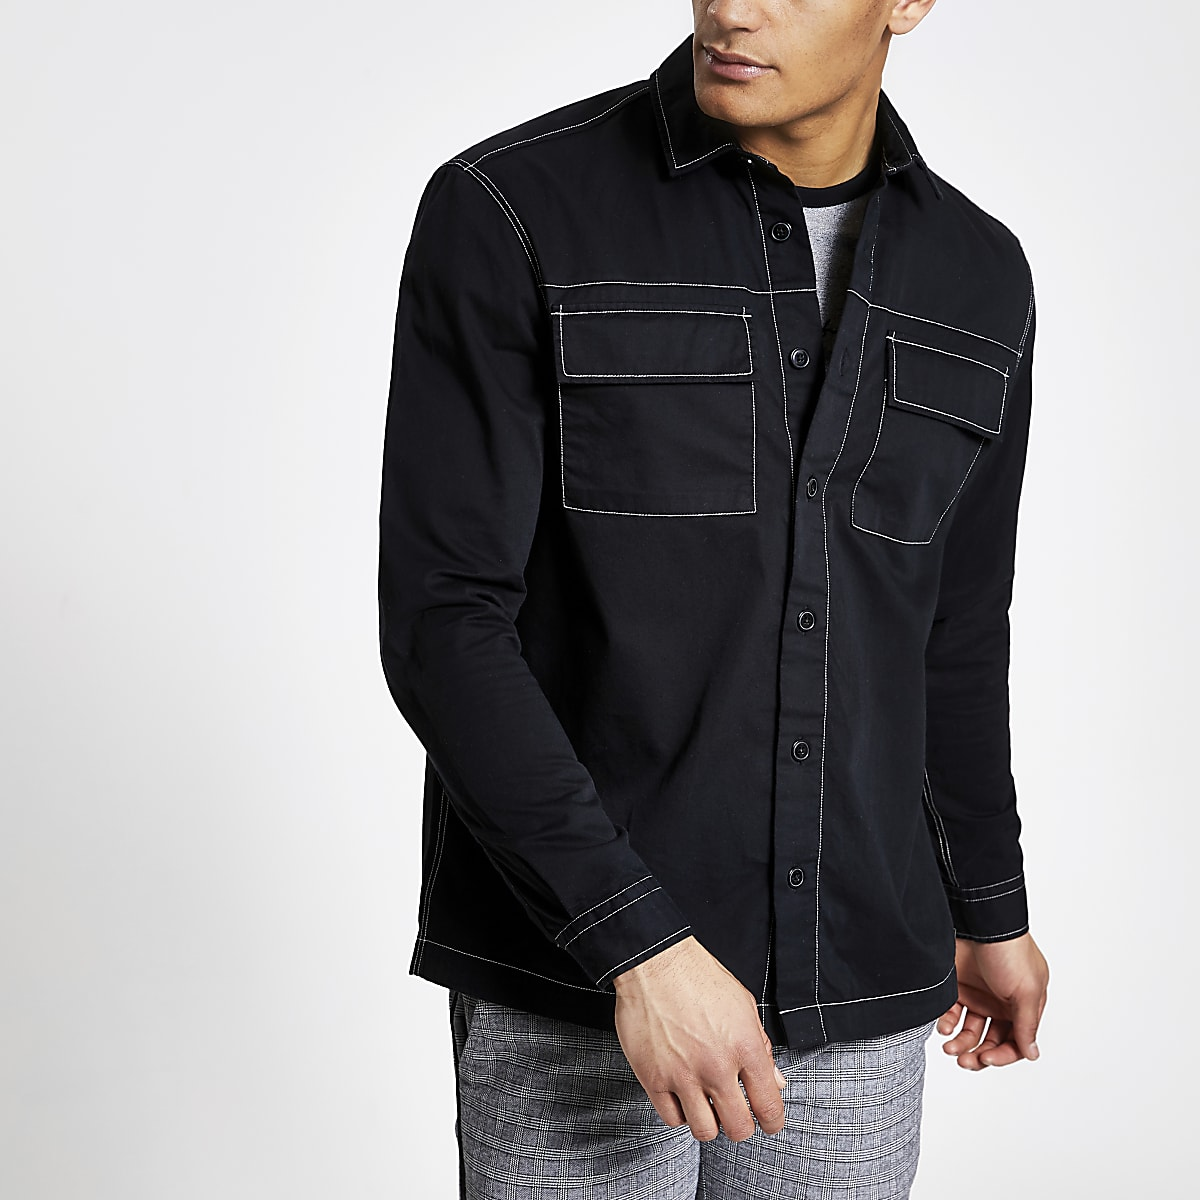 Black contrast overshirt